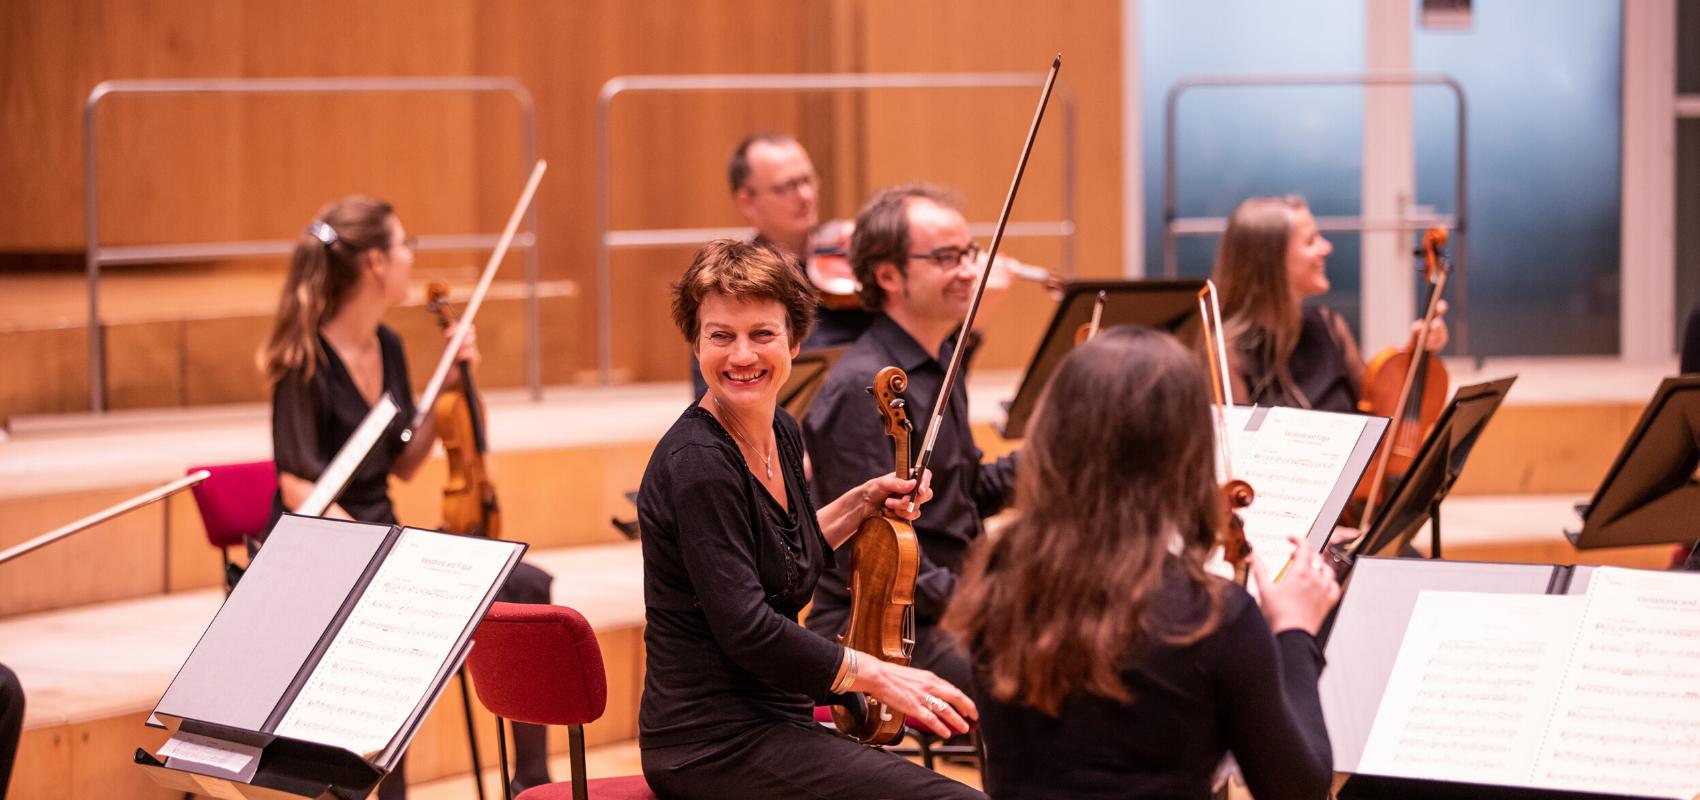 Anderhalvemeterconcert: Strauss & Puccini